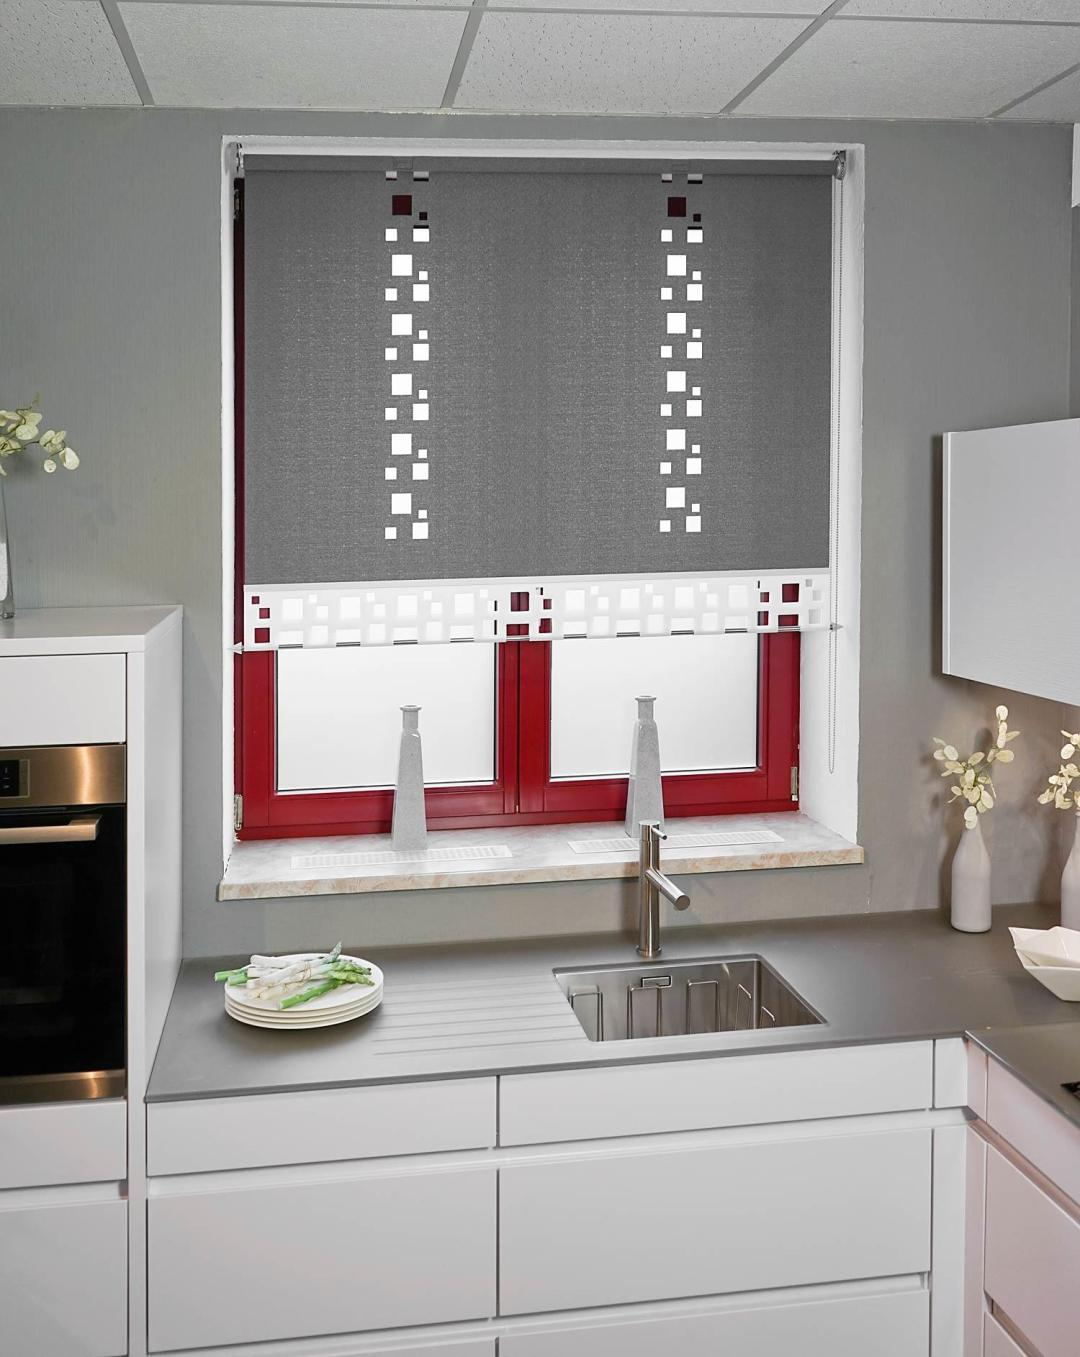 Möbelhaus Hierold Flächenvorhang Lasercut Rollo Basis Kombi-Cut-Abschluss Muster PER Basistextil JOPLIN flint Mustertextil JOPLIN Farbe White